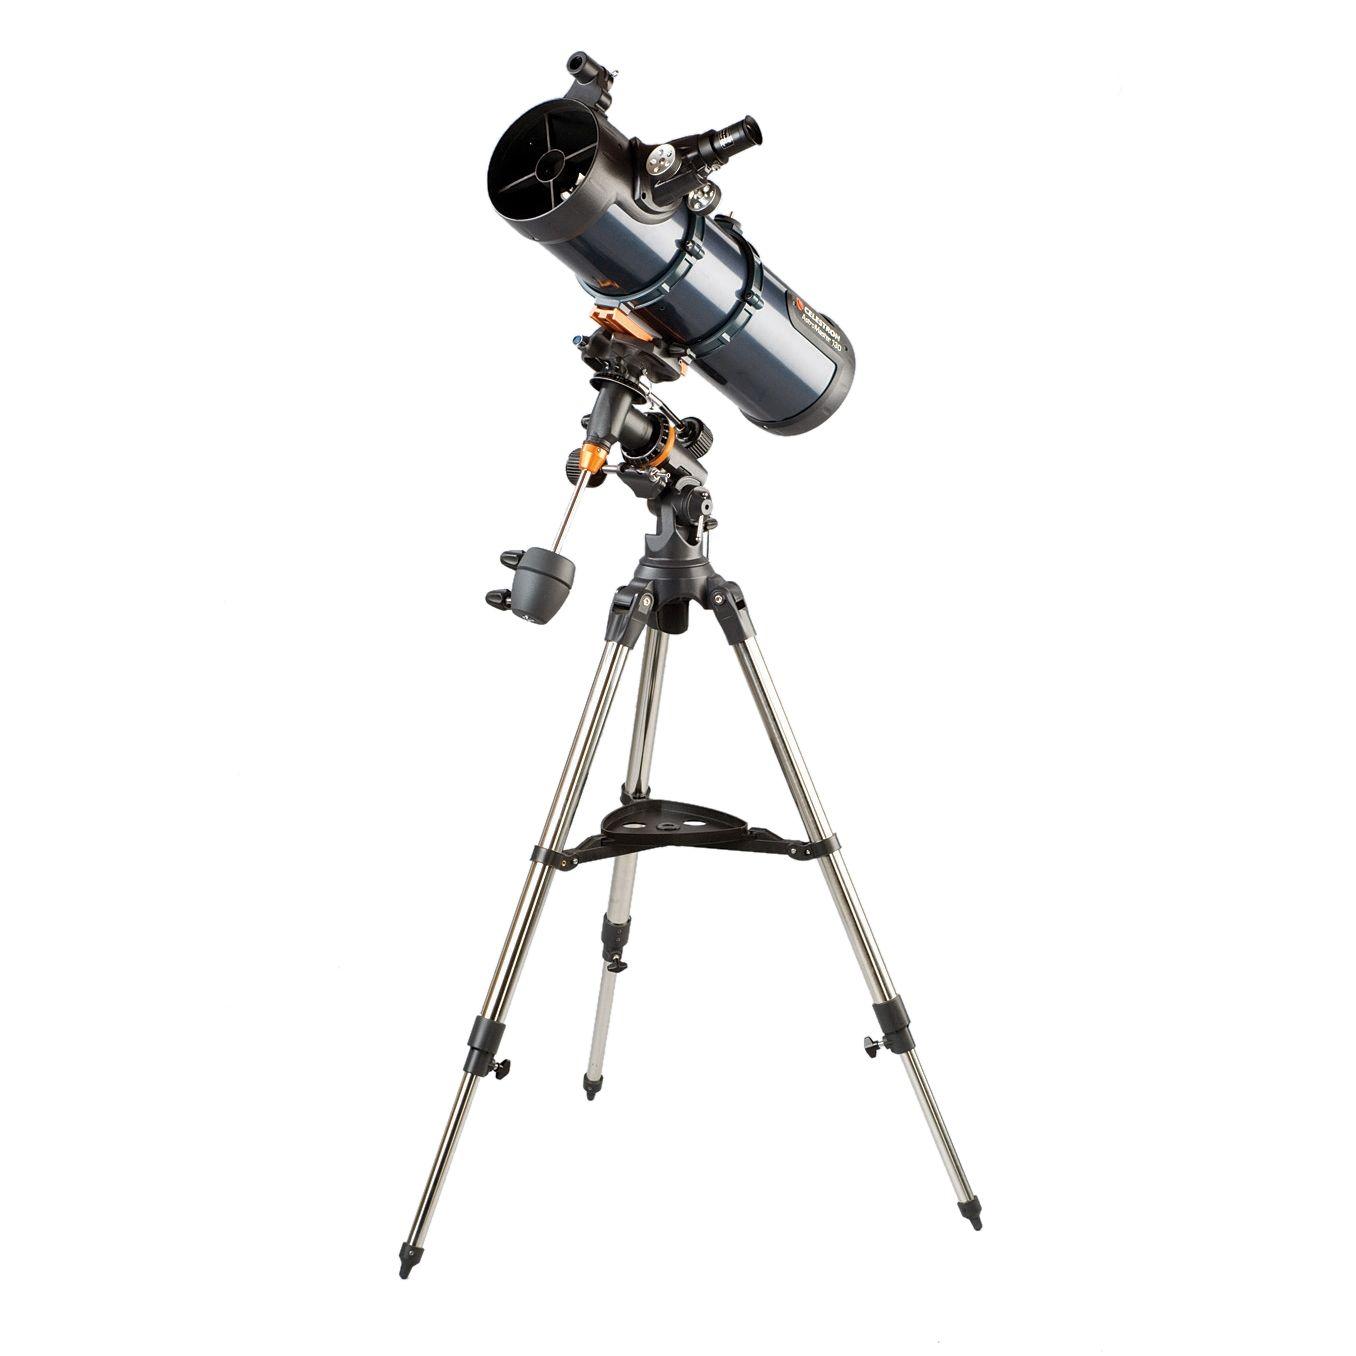 Celestron Celestron AstroMaster 130EQ-MD Telescope